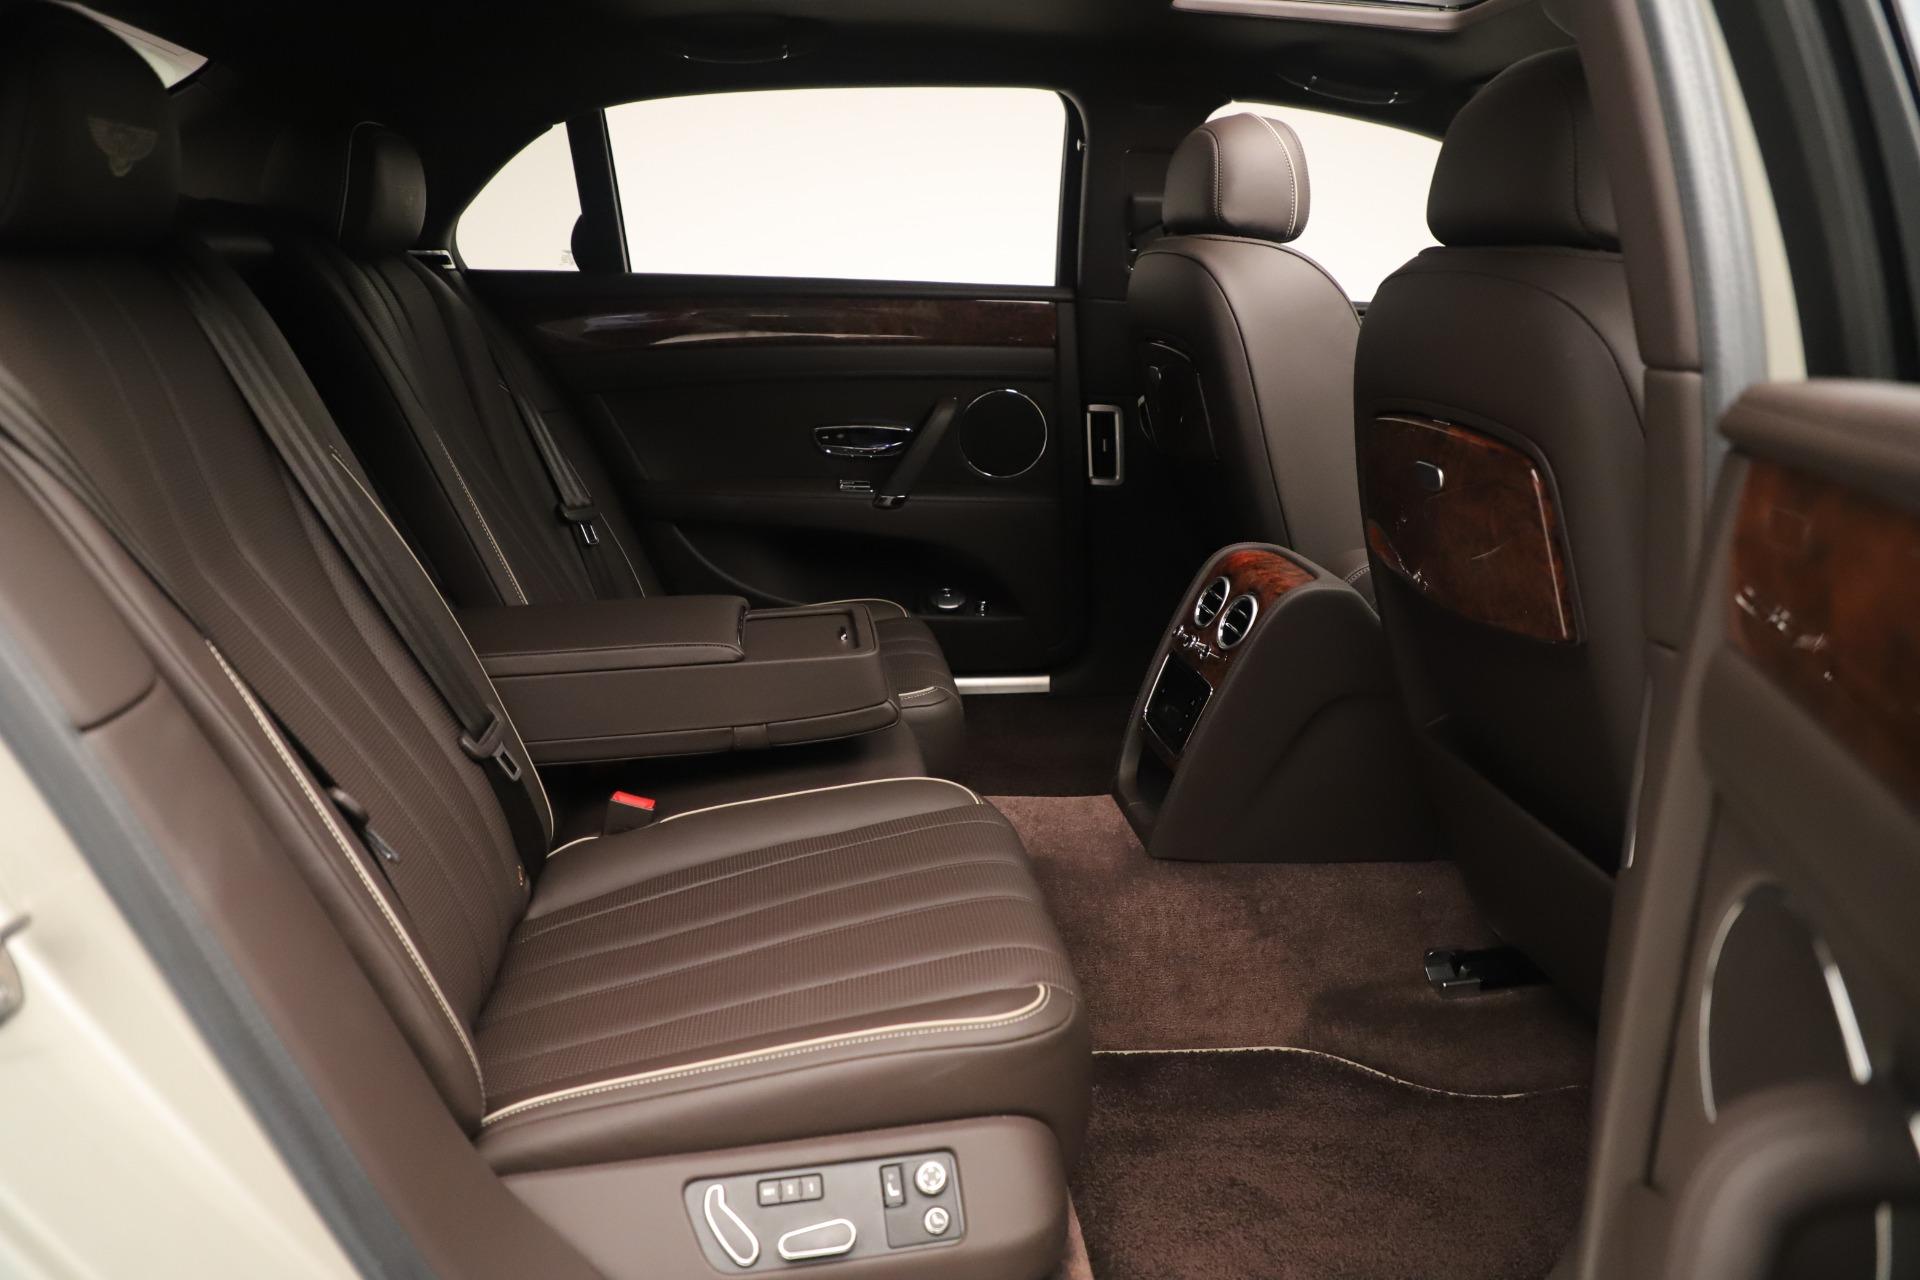 Used 2015 Bentley Flying Spur V8 For Sale In Westport, CT 3444_p29